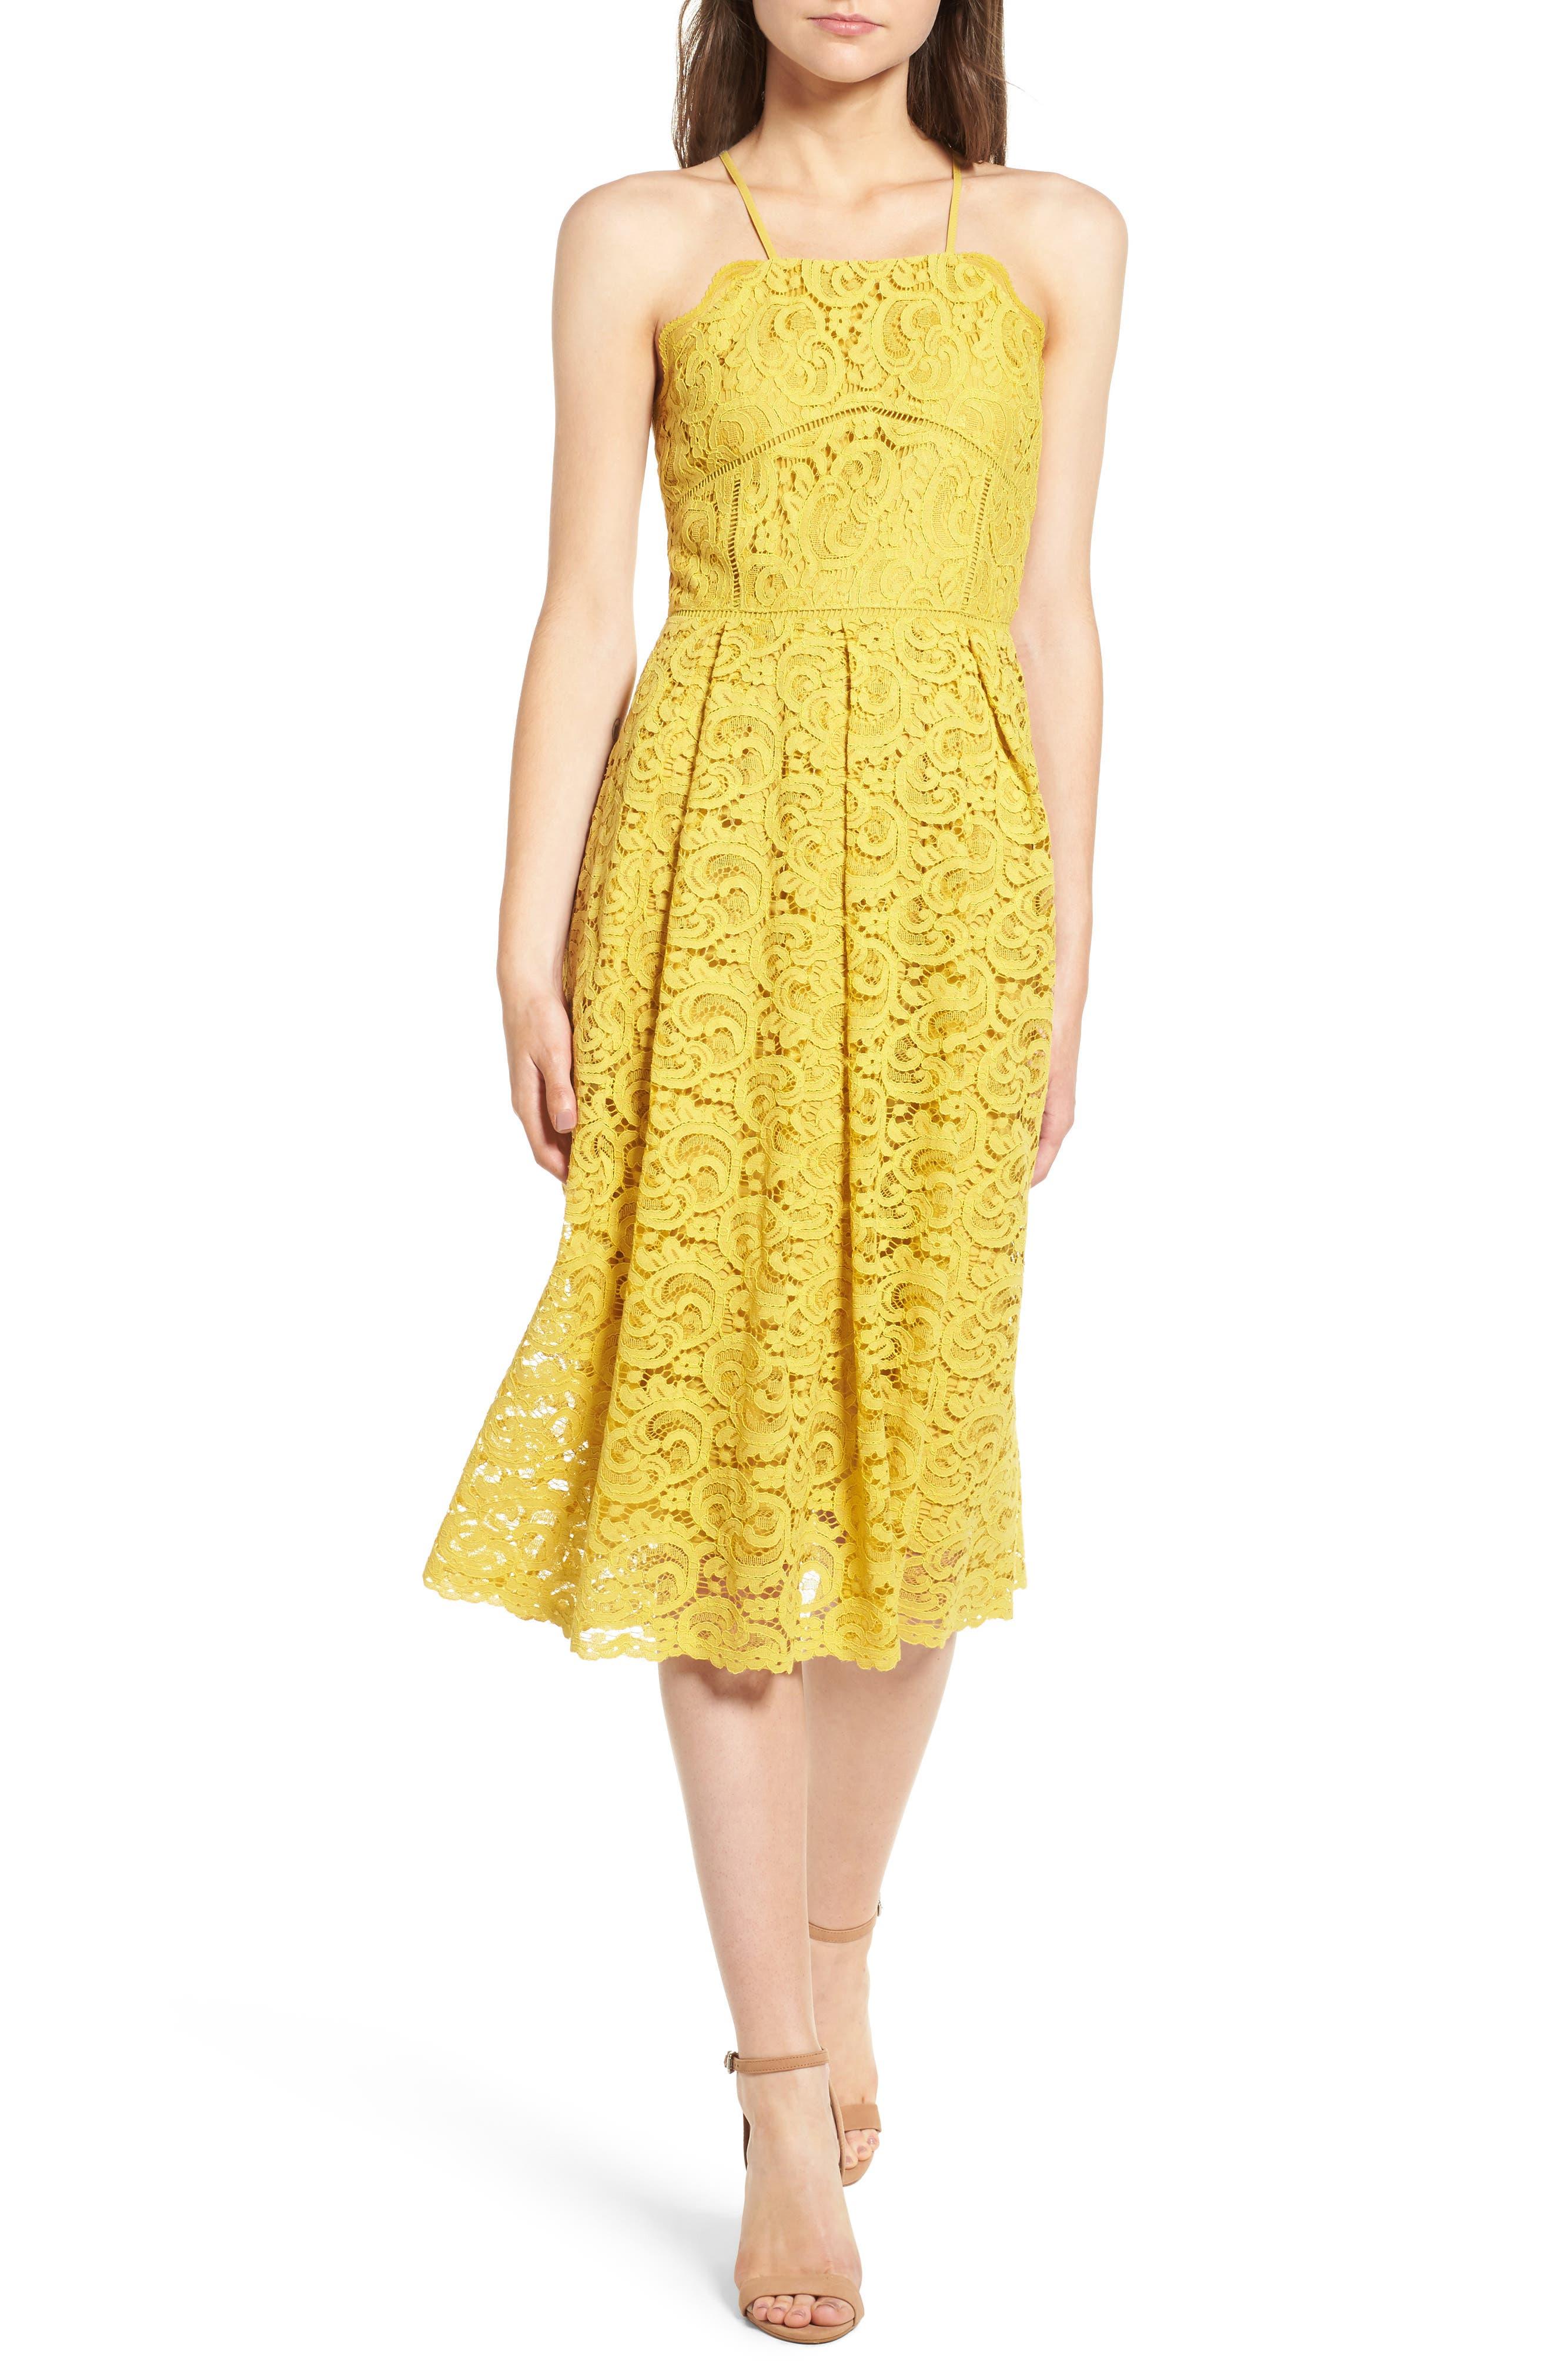 Alternate Image 1 Selected - J.O.A. Lace Midi Dress